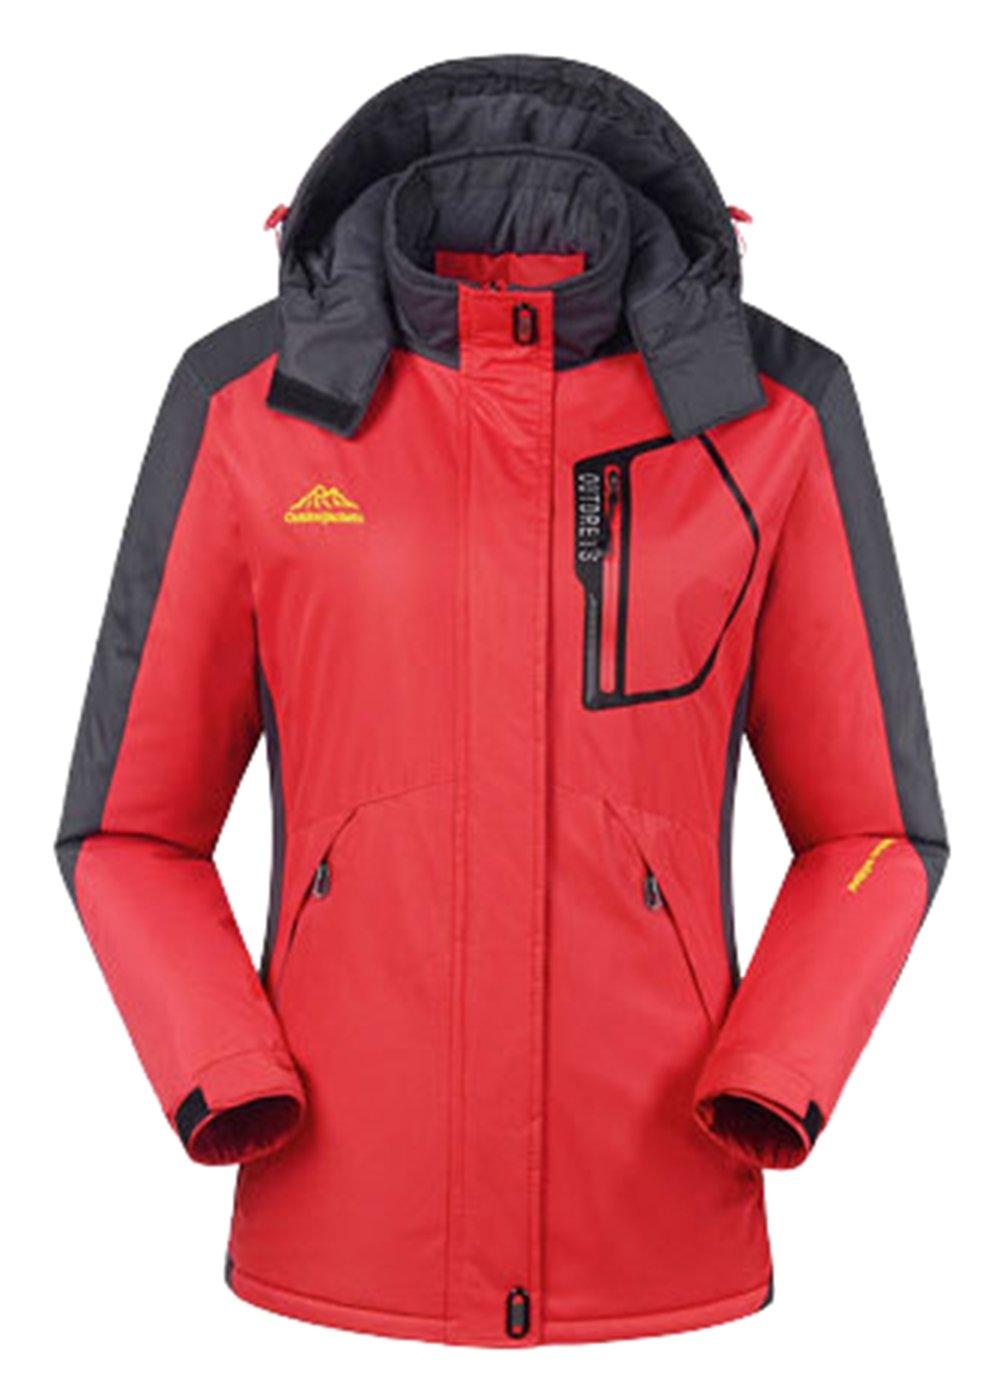 Red Women Large Lottaway Fleece Couple Durable Storm Breath Outdoor WarmingUp Ski Parka Jacket